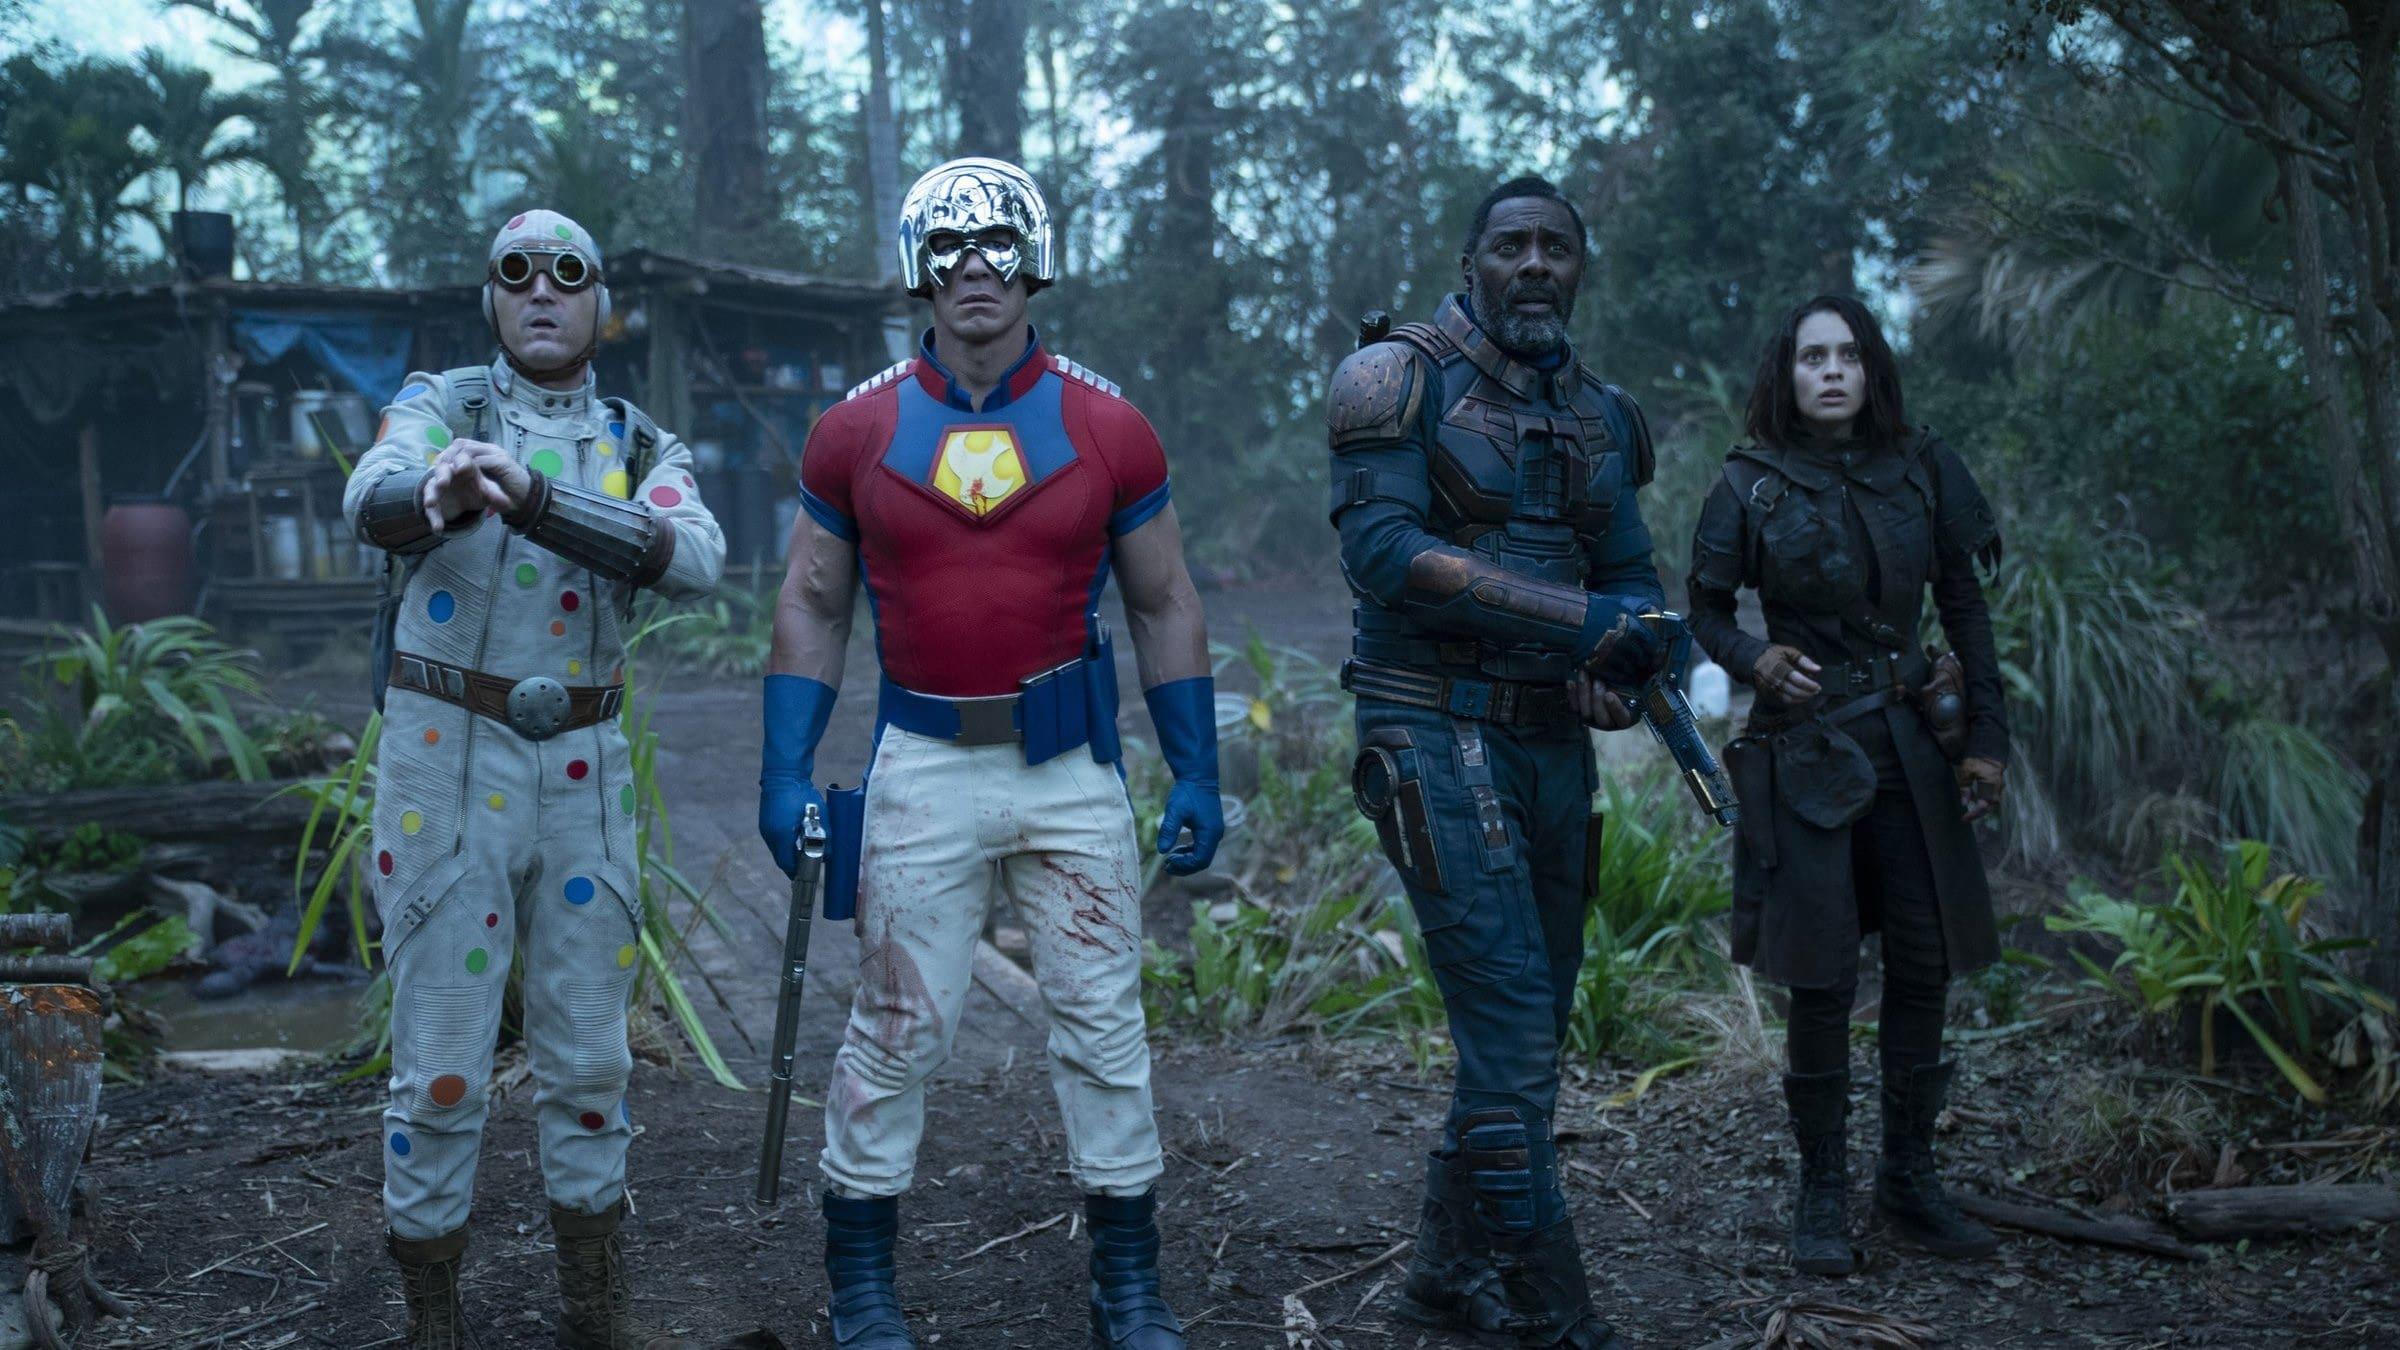 The Suicide Squad backdrop